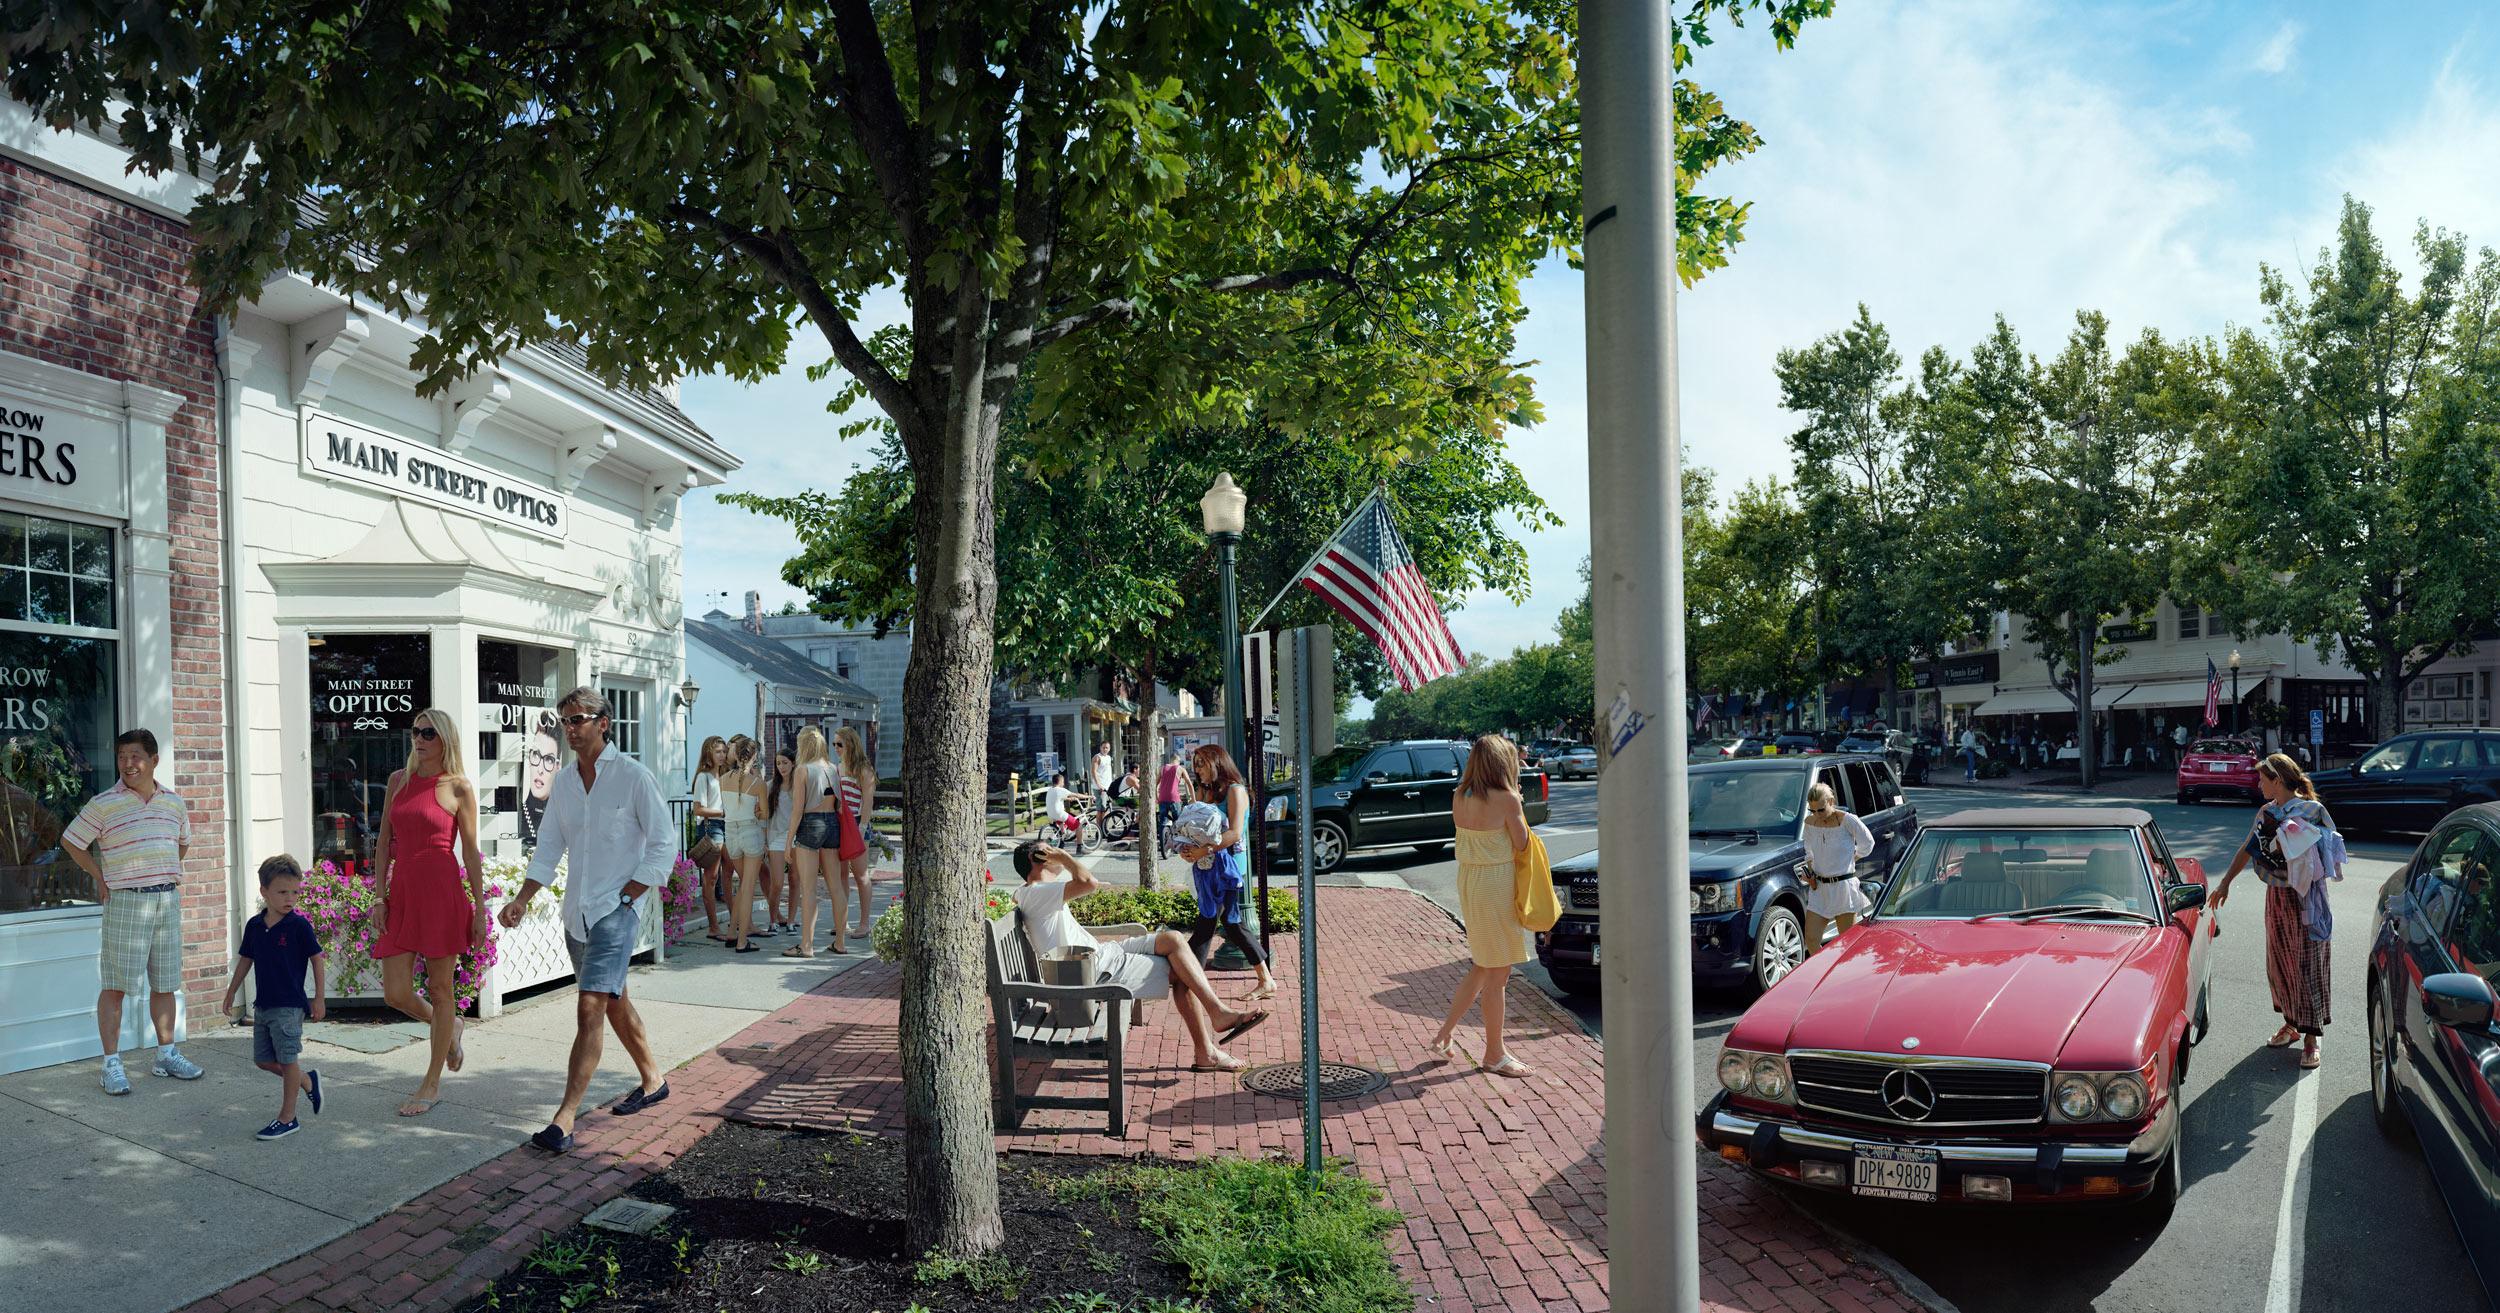 Main Street Optics, Main Street, Southampton, New York.